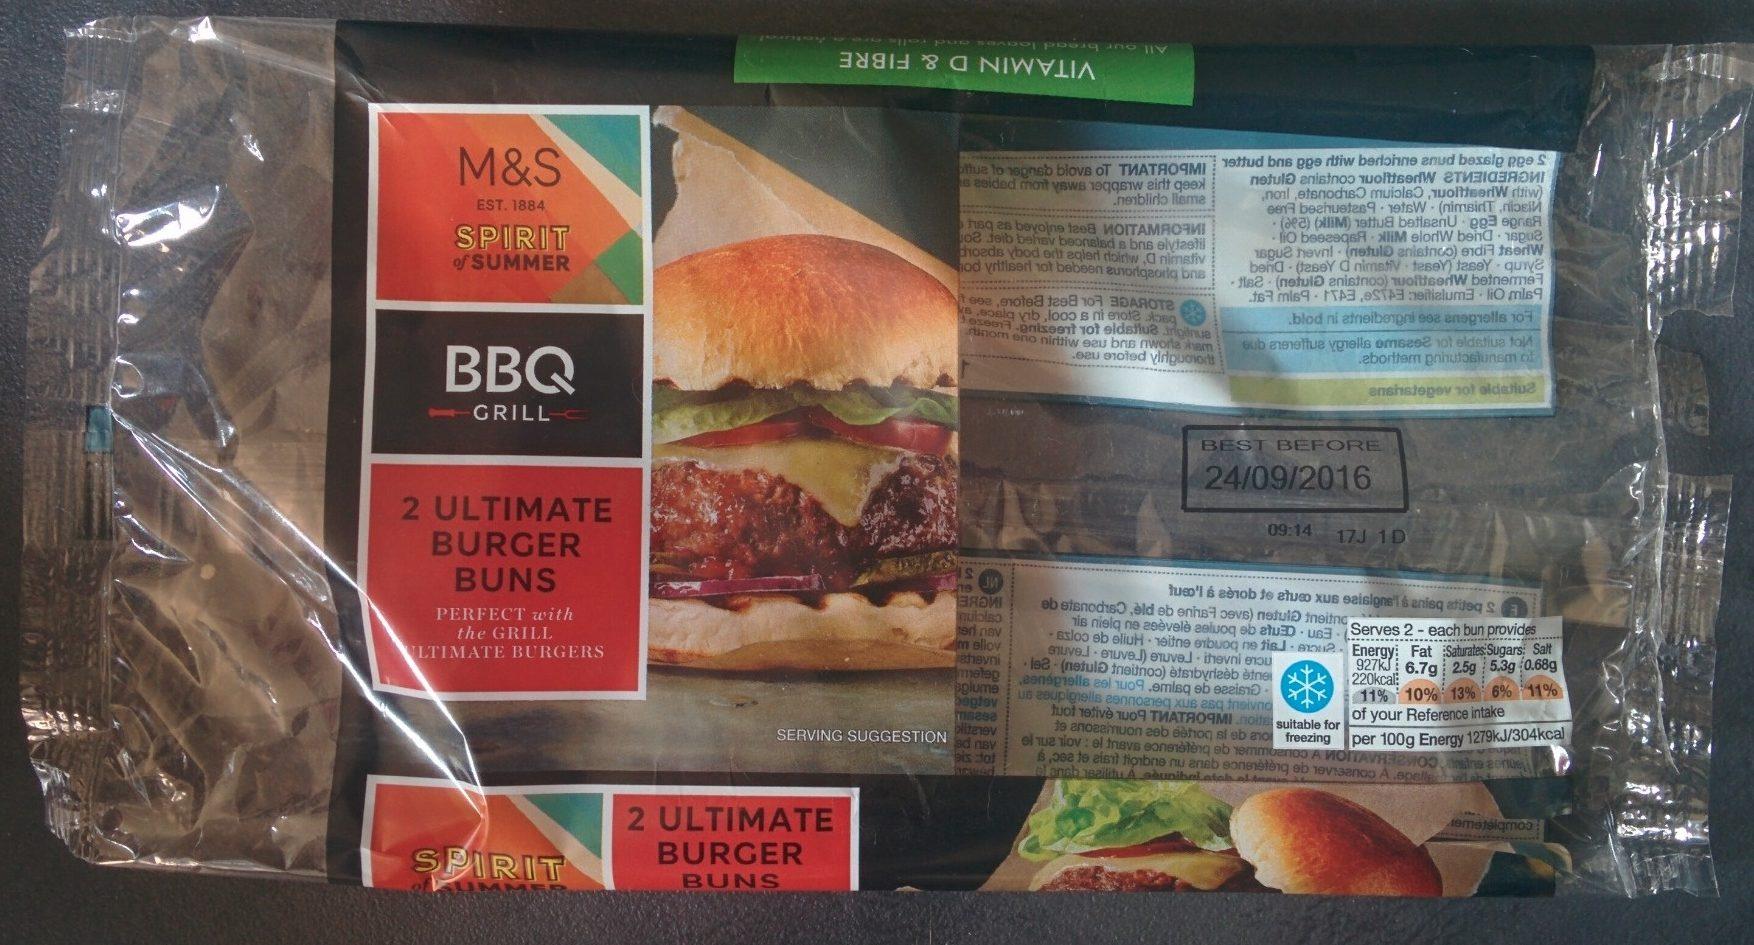 2 Ultimate Burger Buns - Produit